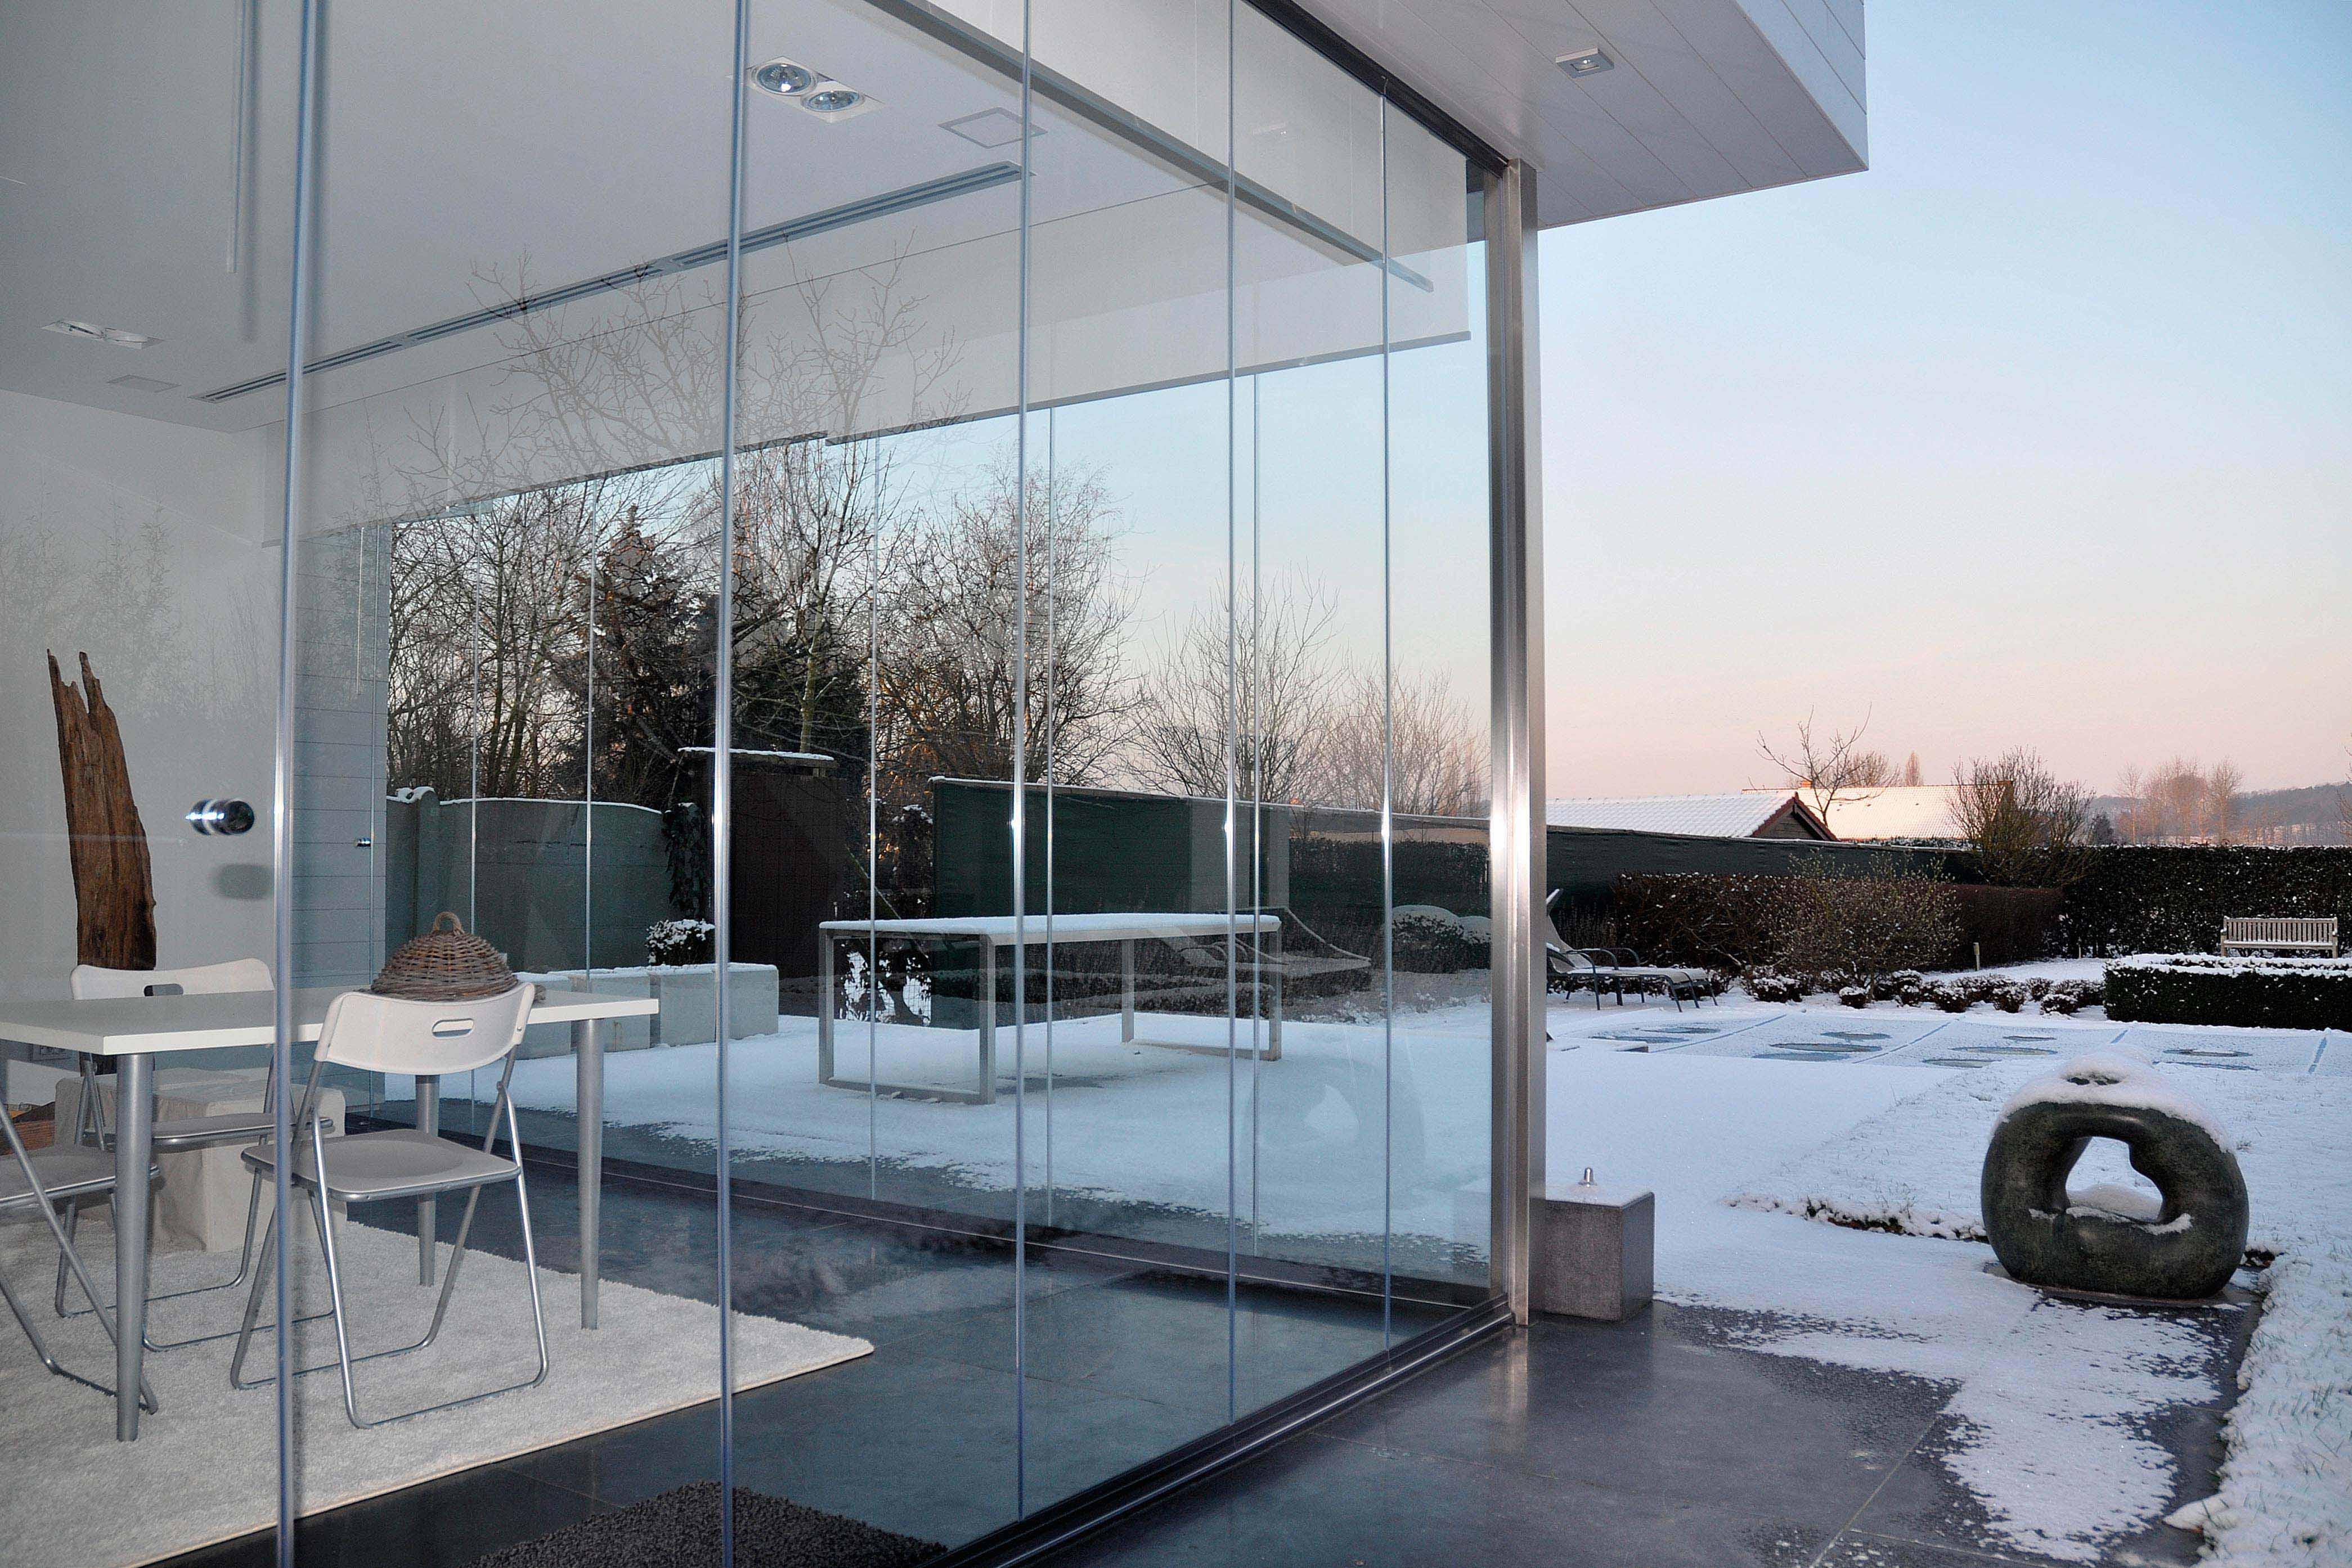 Cerramiento de cristal para porche en Bélgica